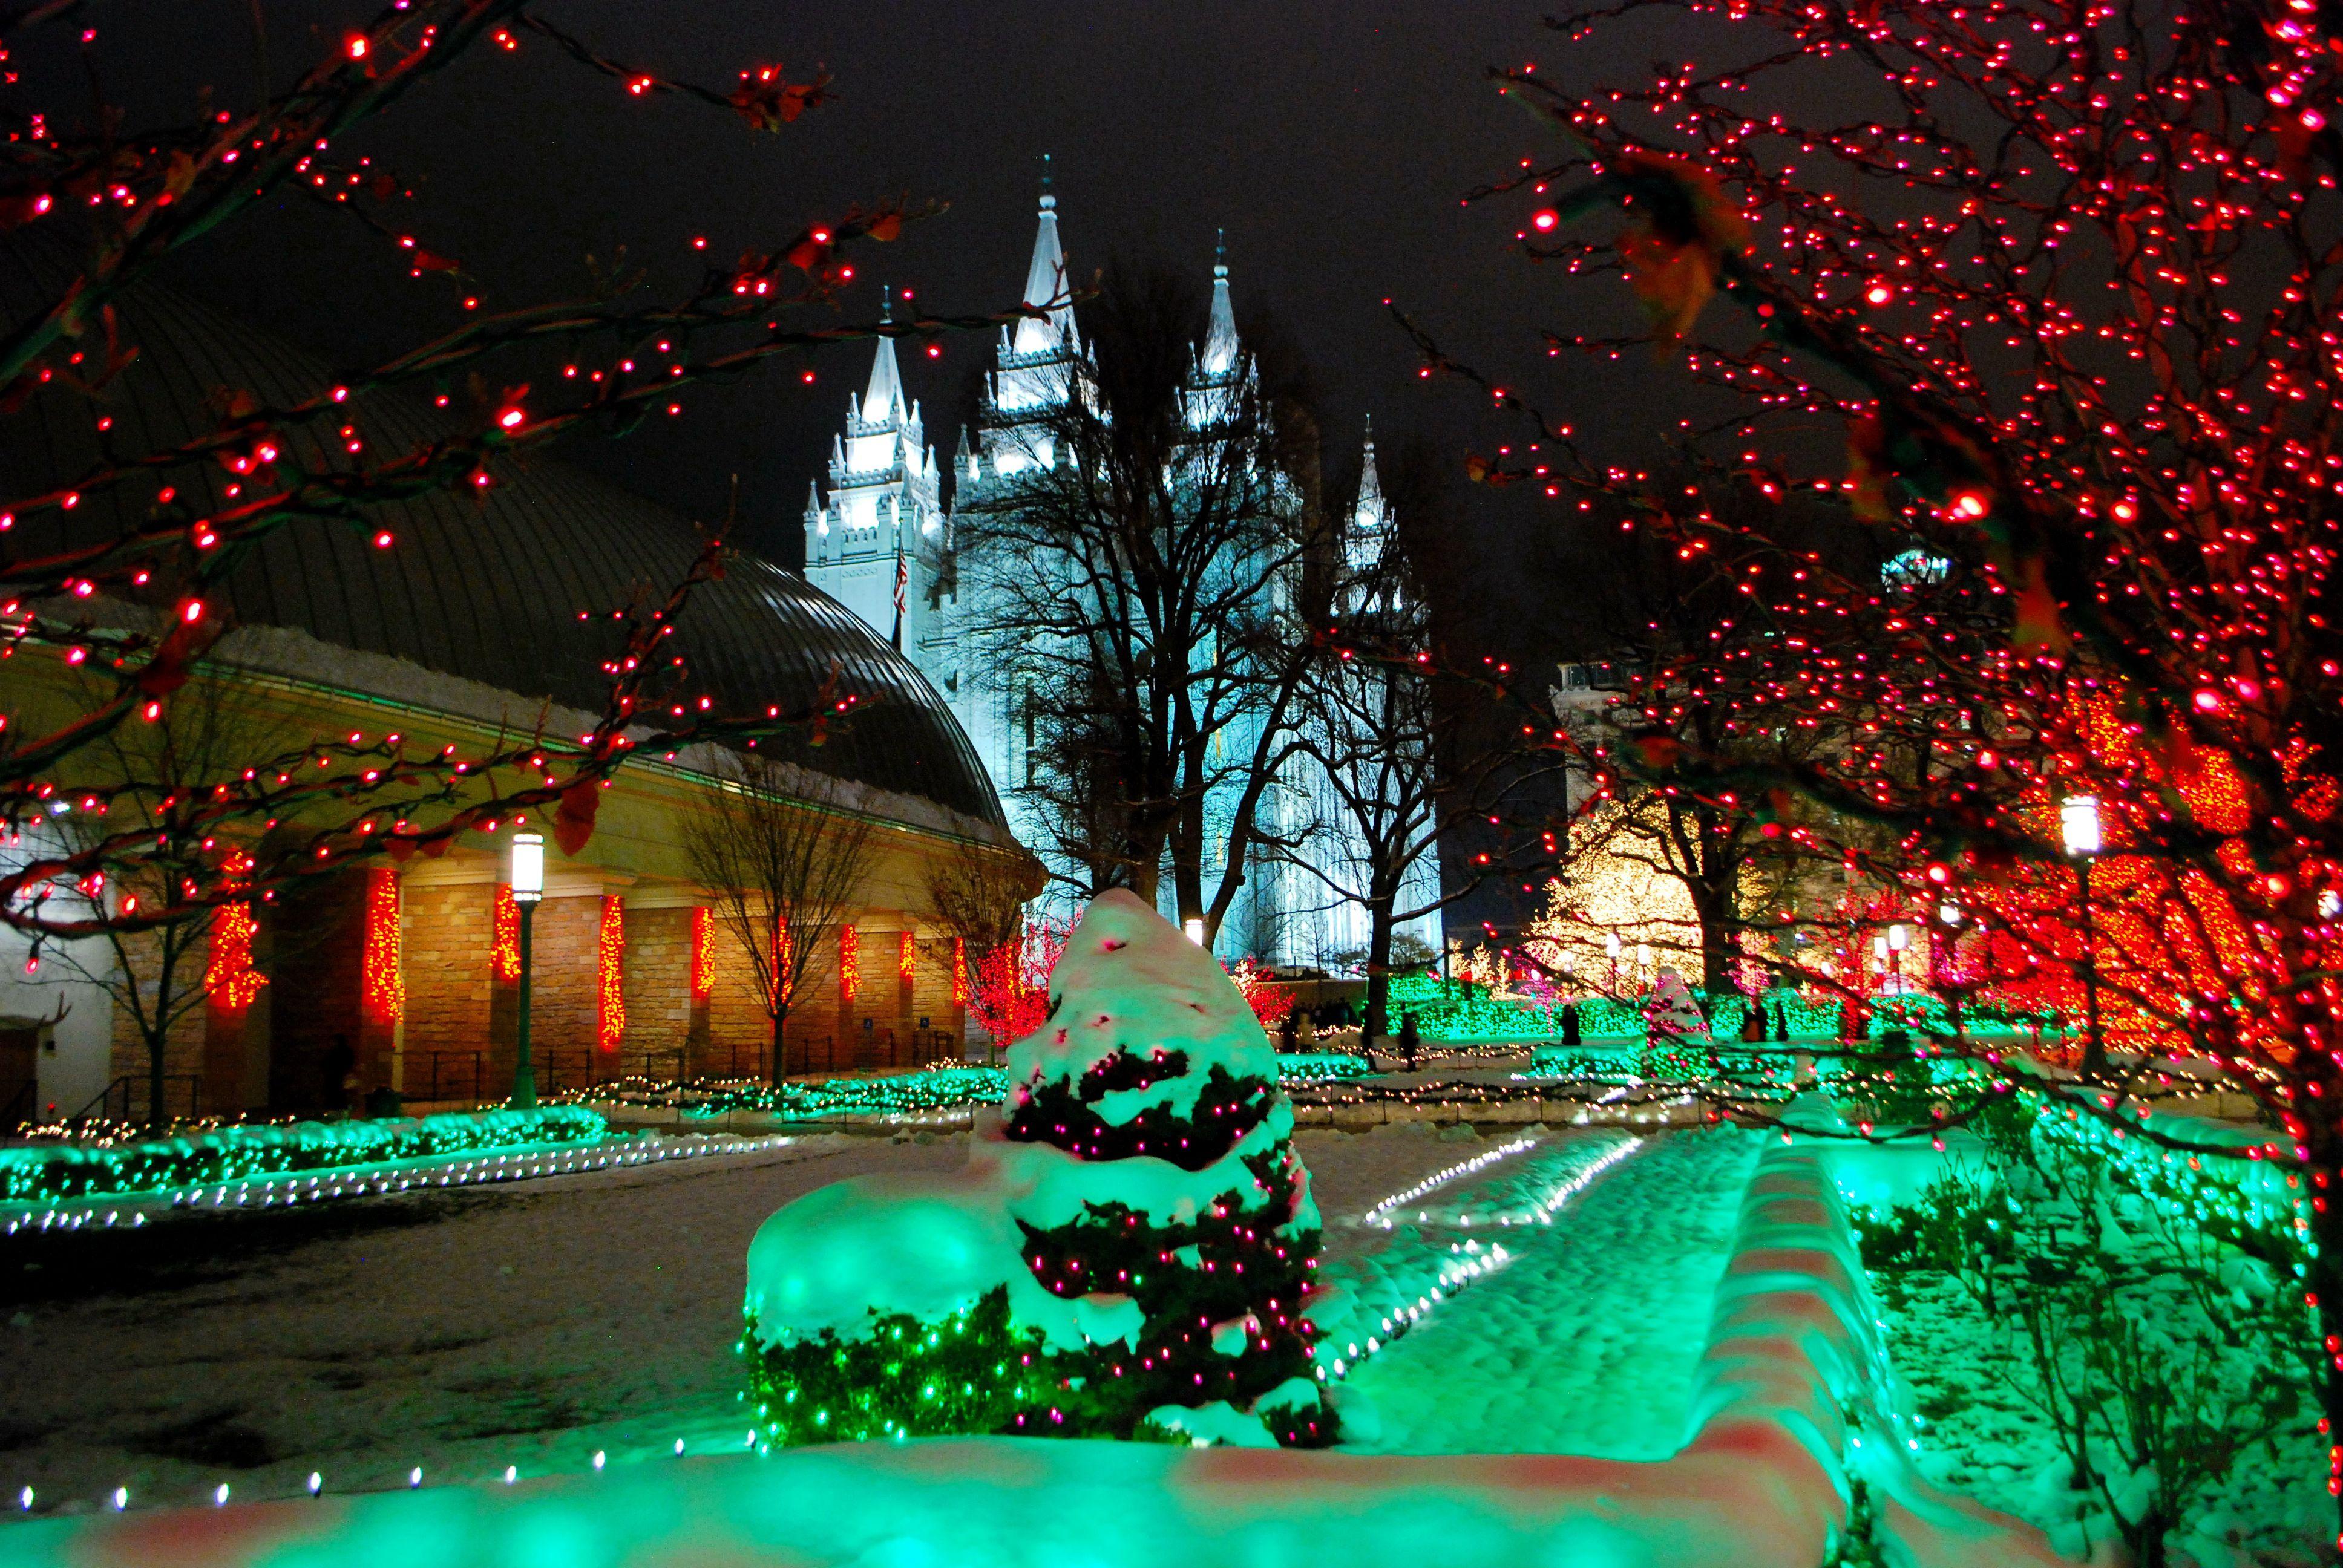 Historical Weather For 2013 in Salt Lake City, Utah, USA ... |Salt Lake City Temperature